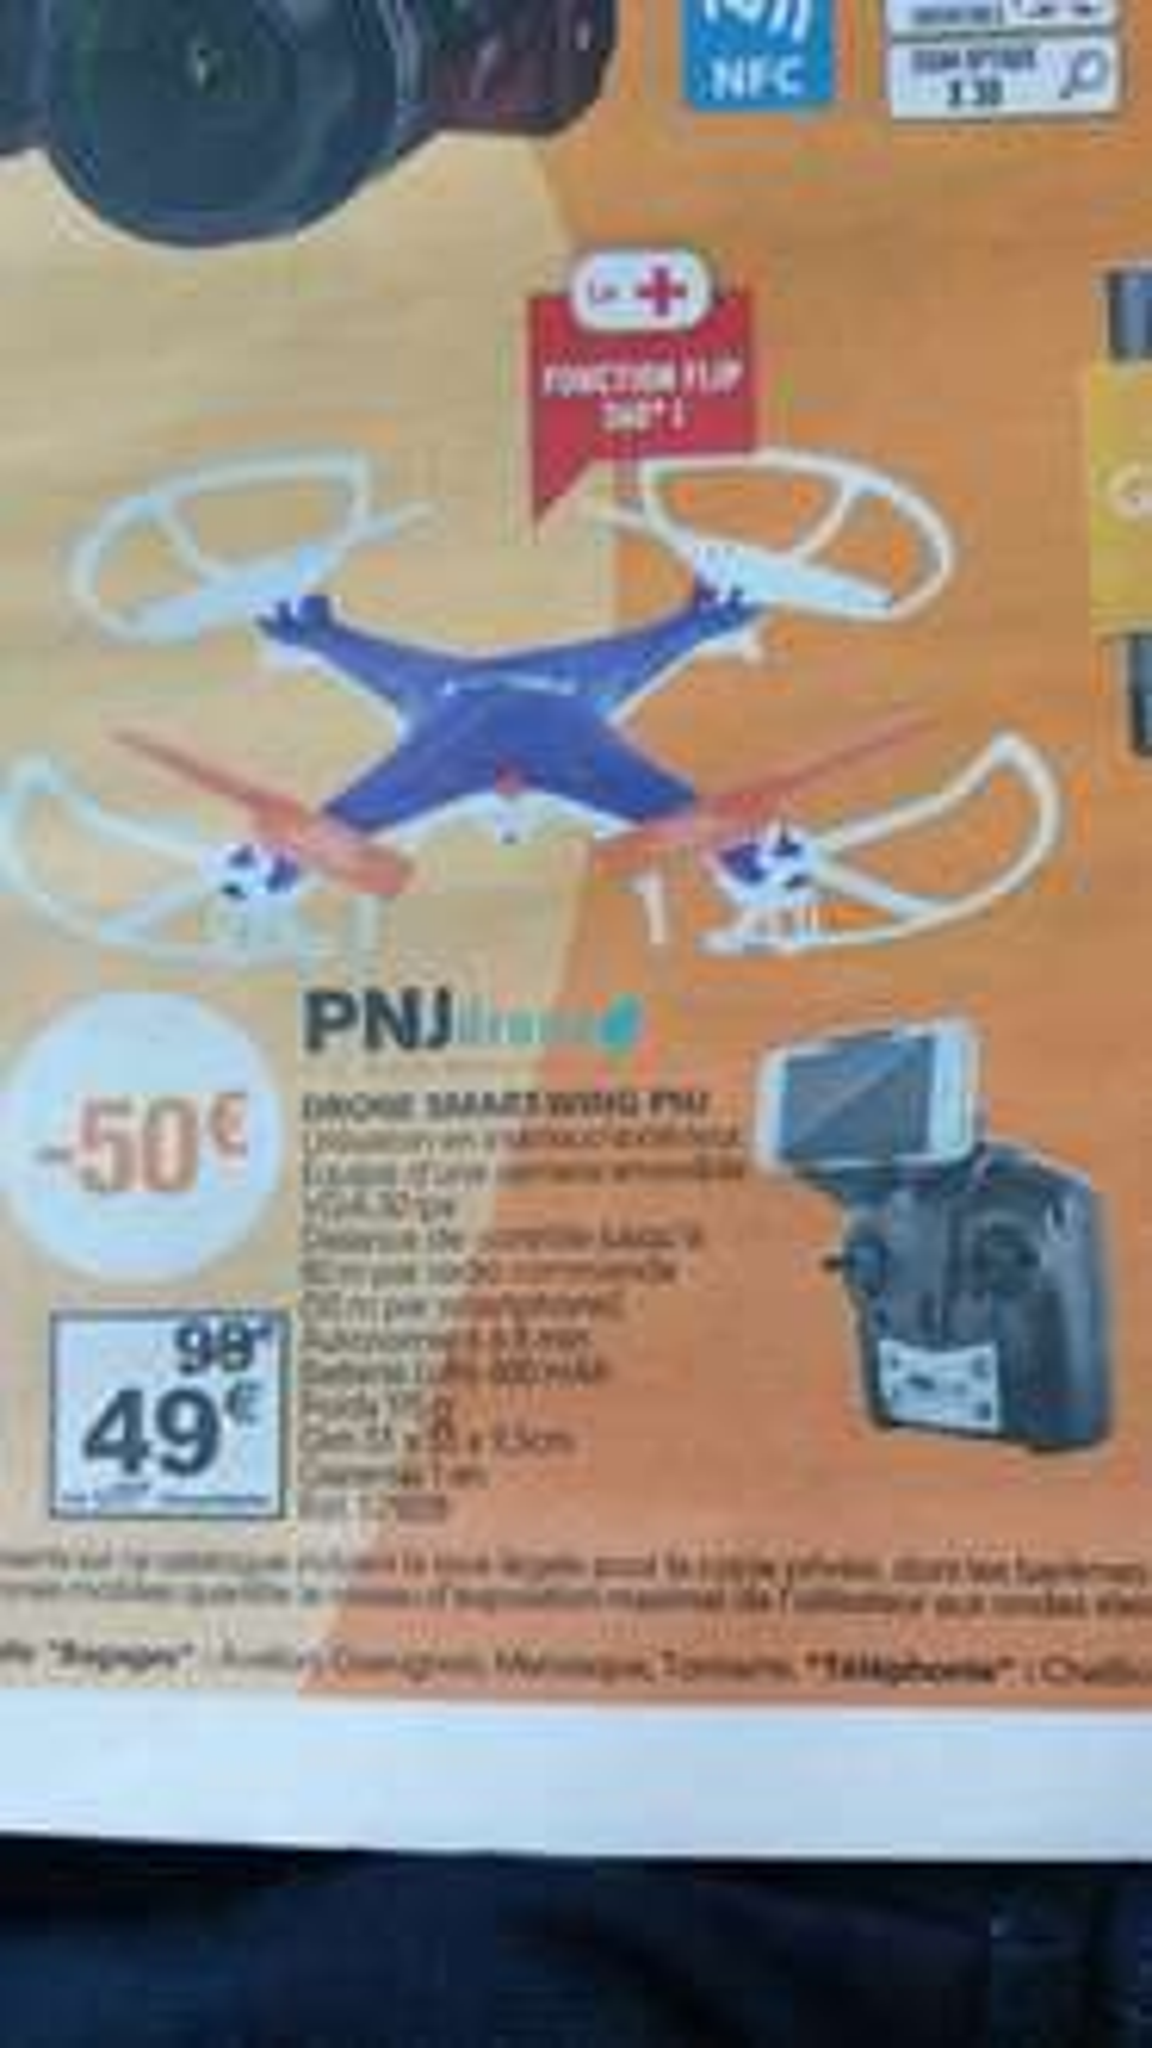 Drone Smart-Wing PNJdrone - avec caméra VGA 30ips